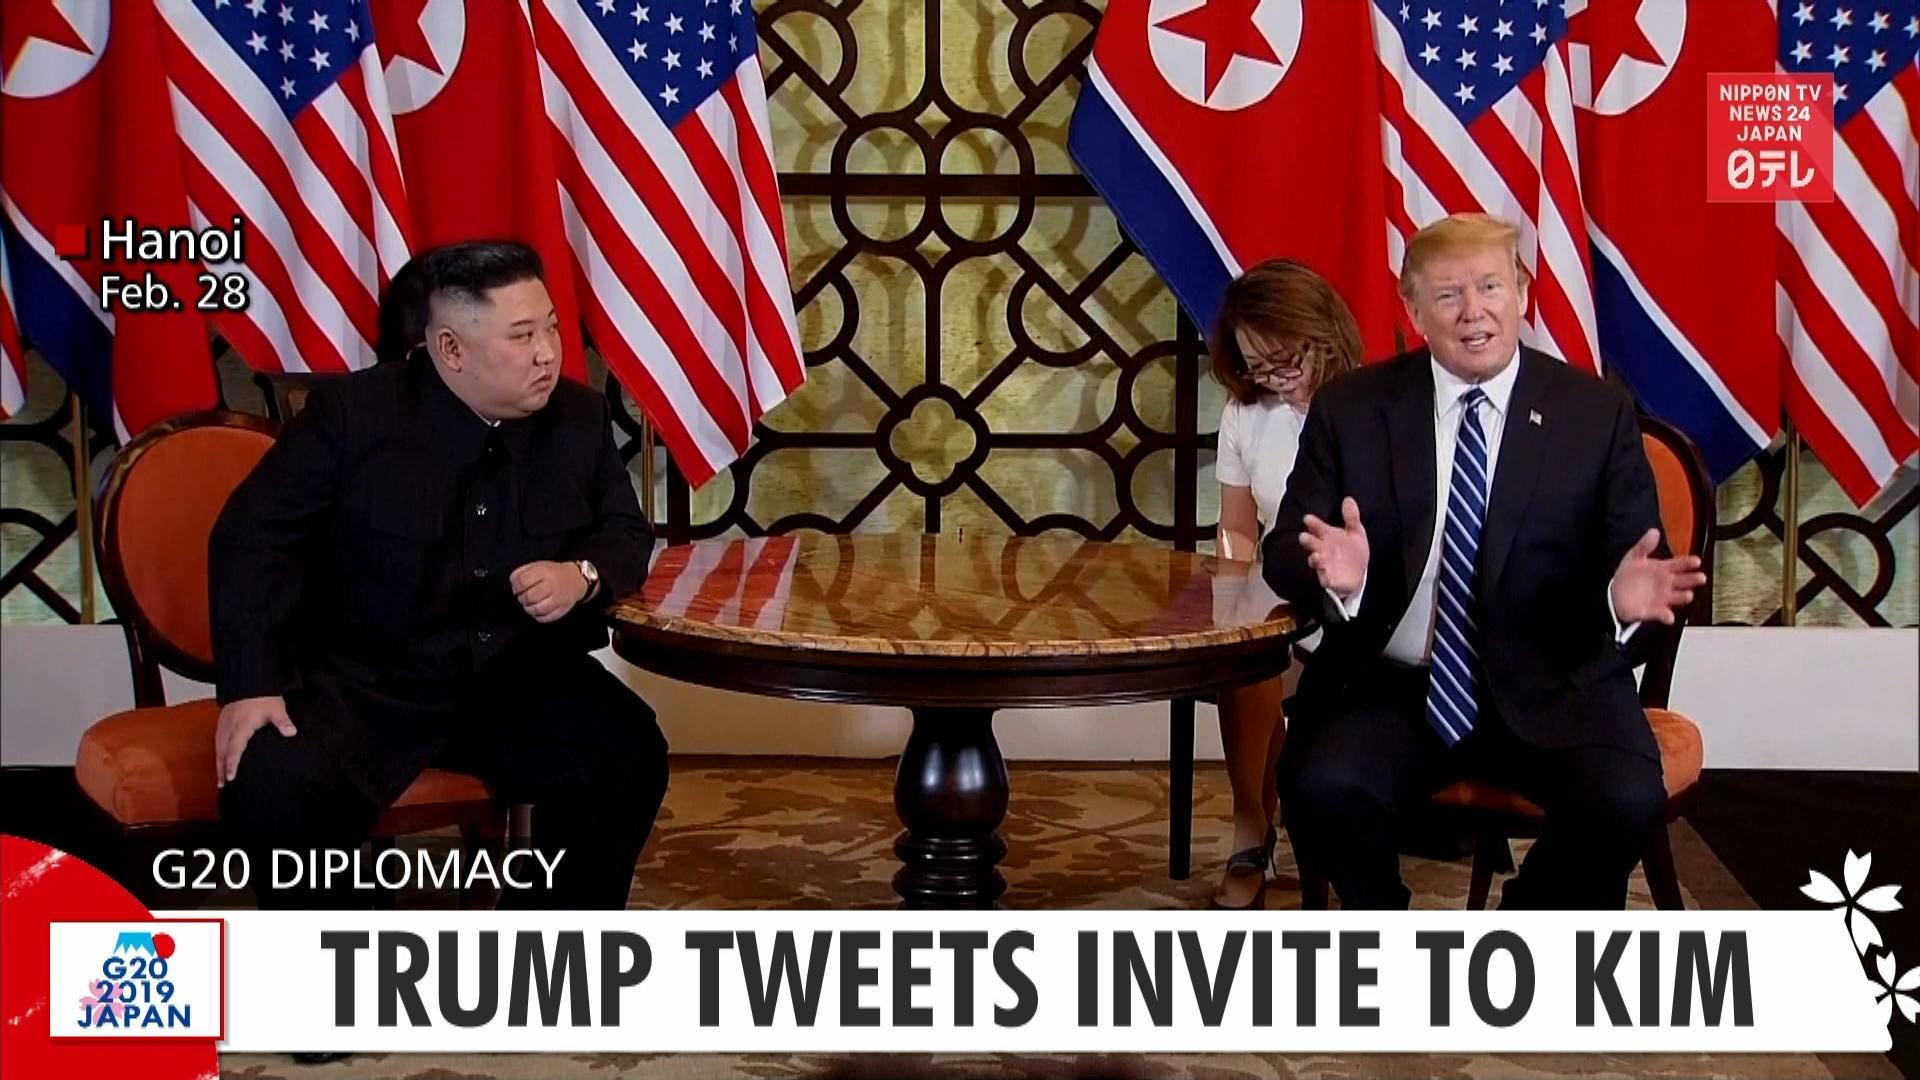 G20: Trump tweets to invite Kim